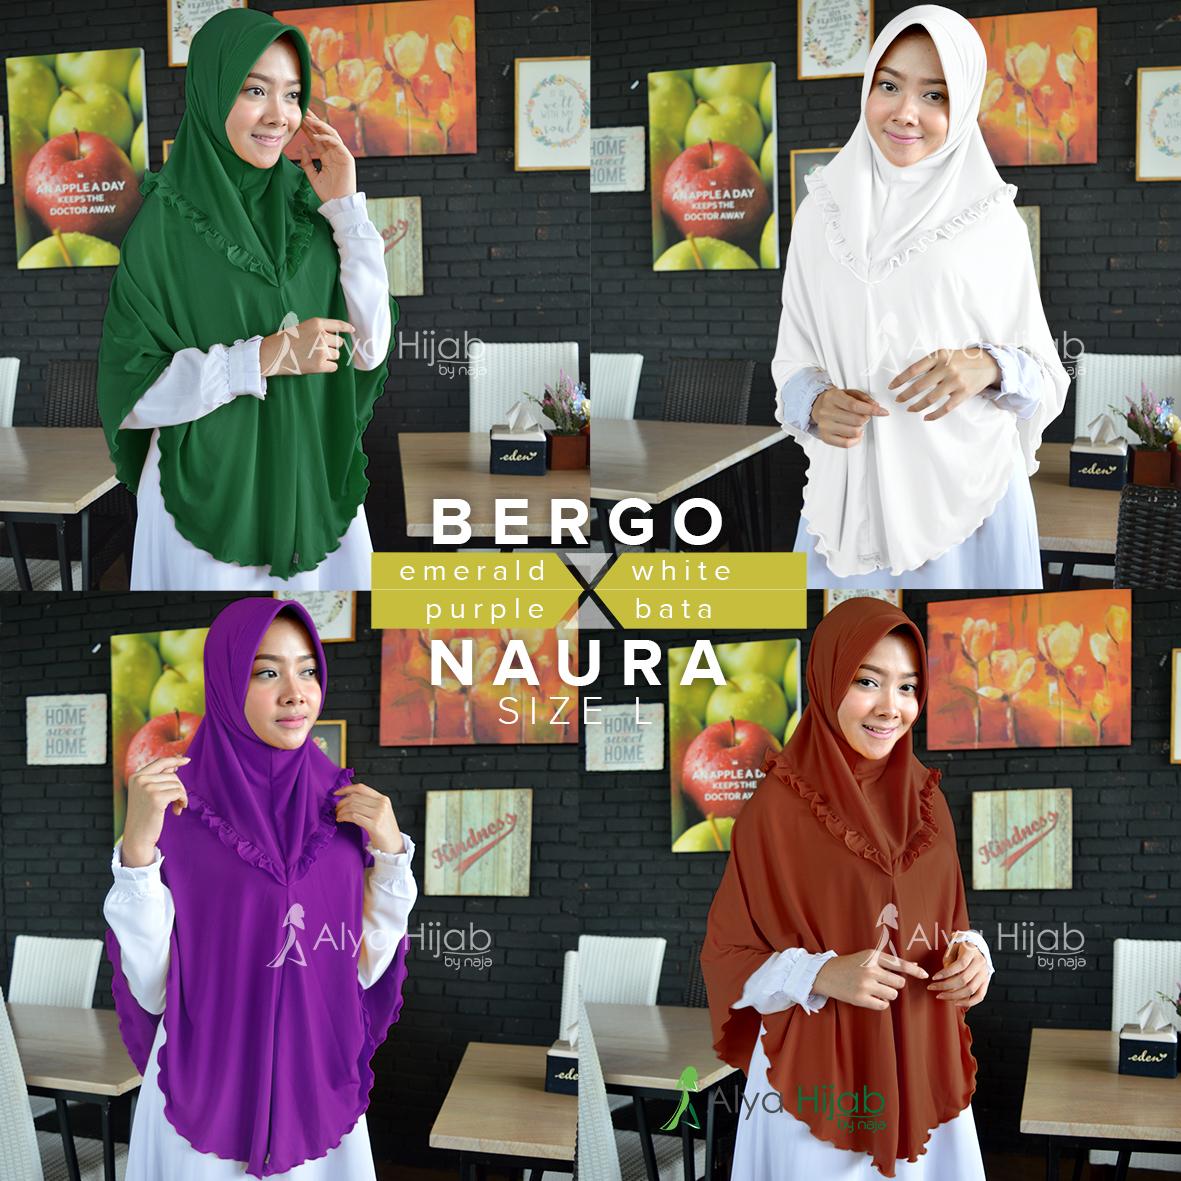 Jilbab Terbaru 2017 Bergo Naura Alya Hijab By Naja Jual Hijab